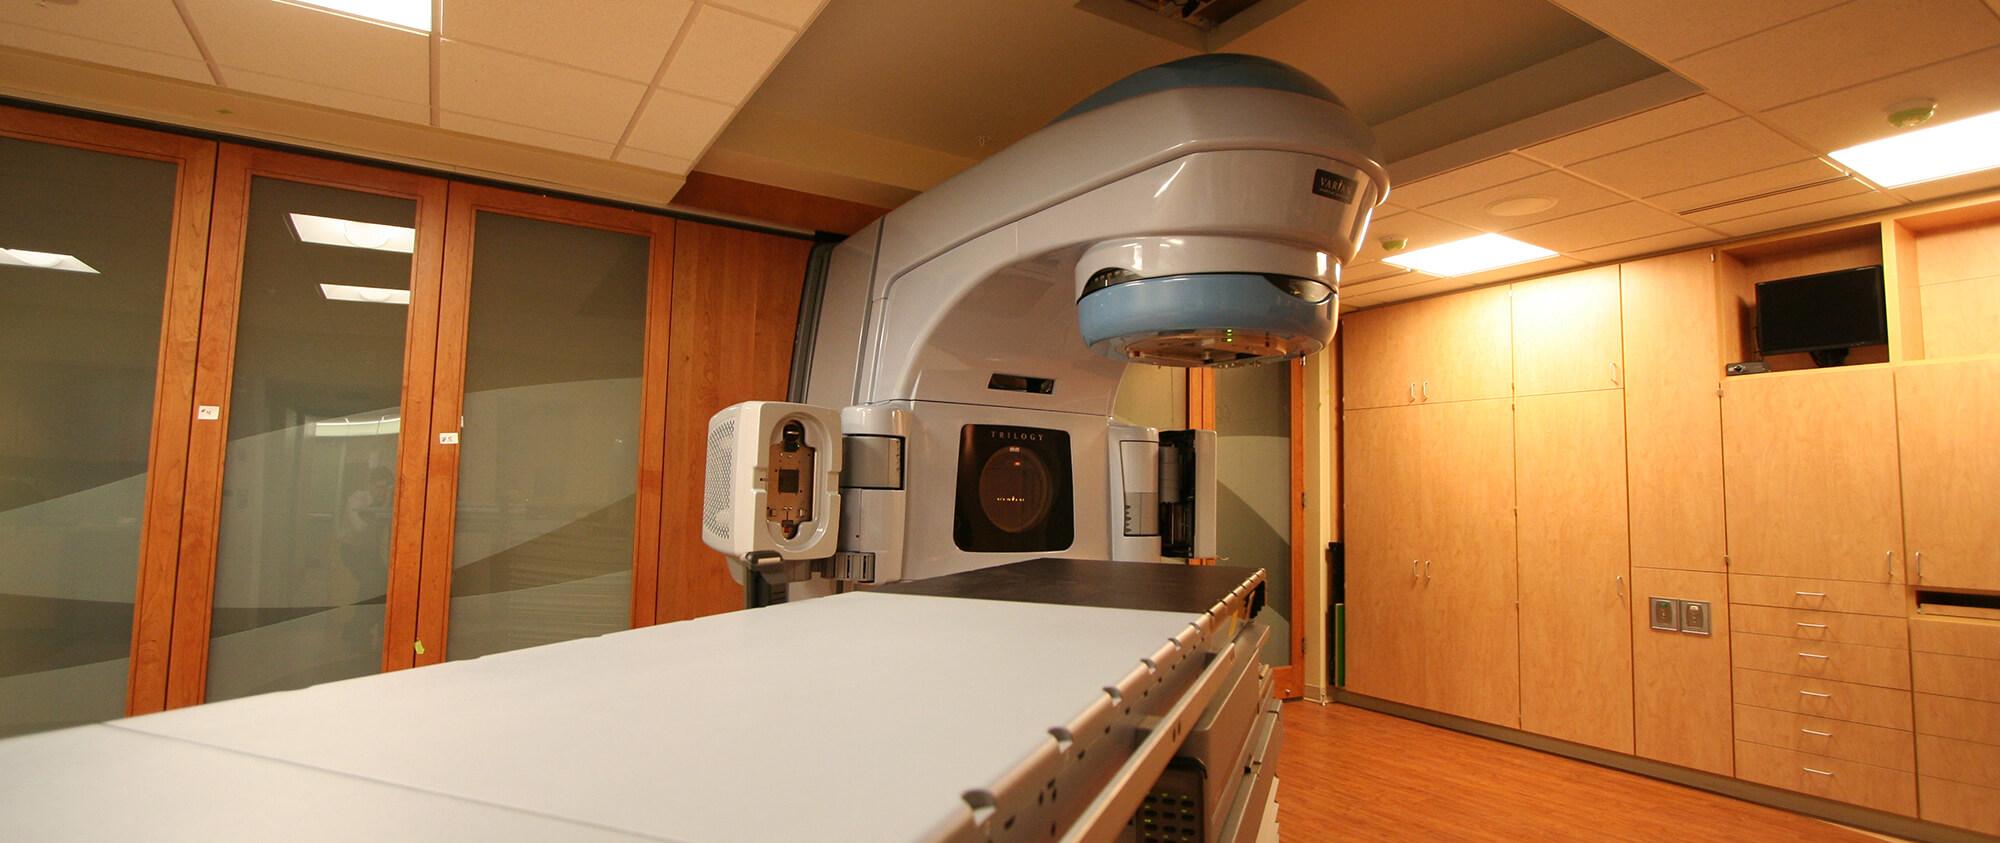 ohsu radiation oncology